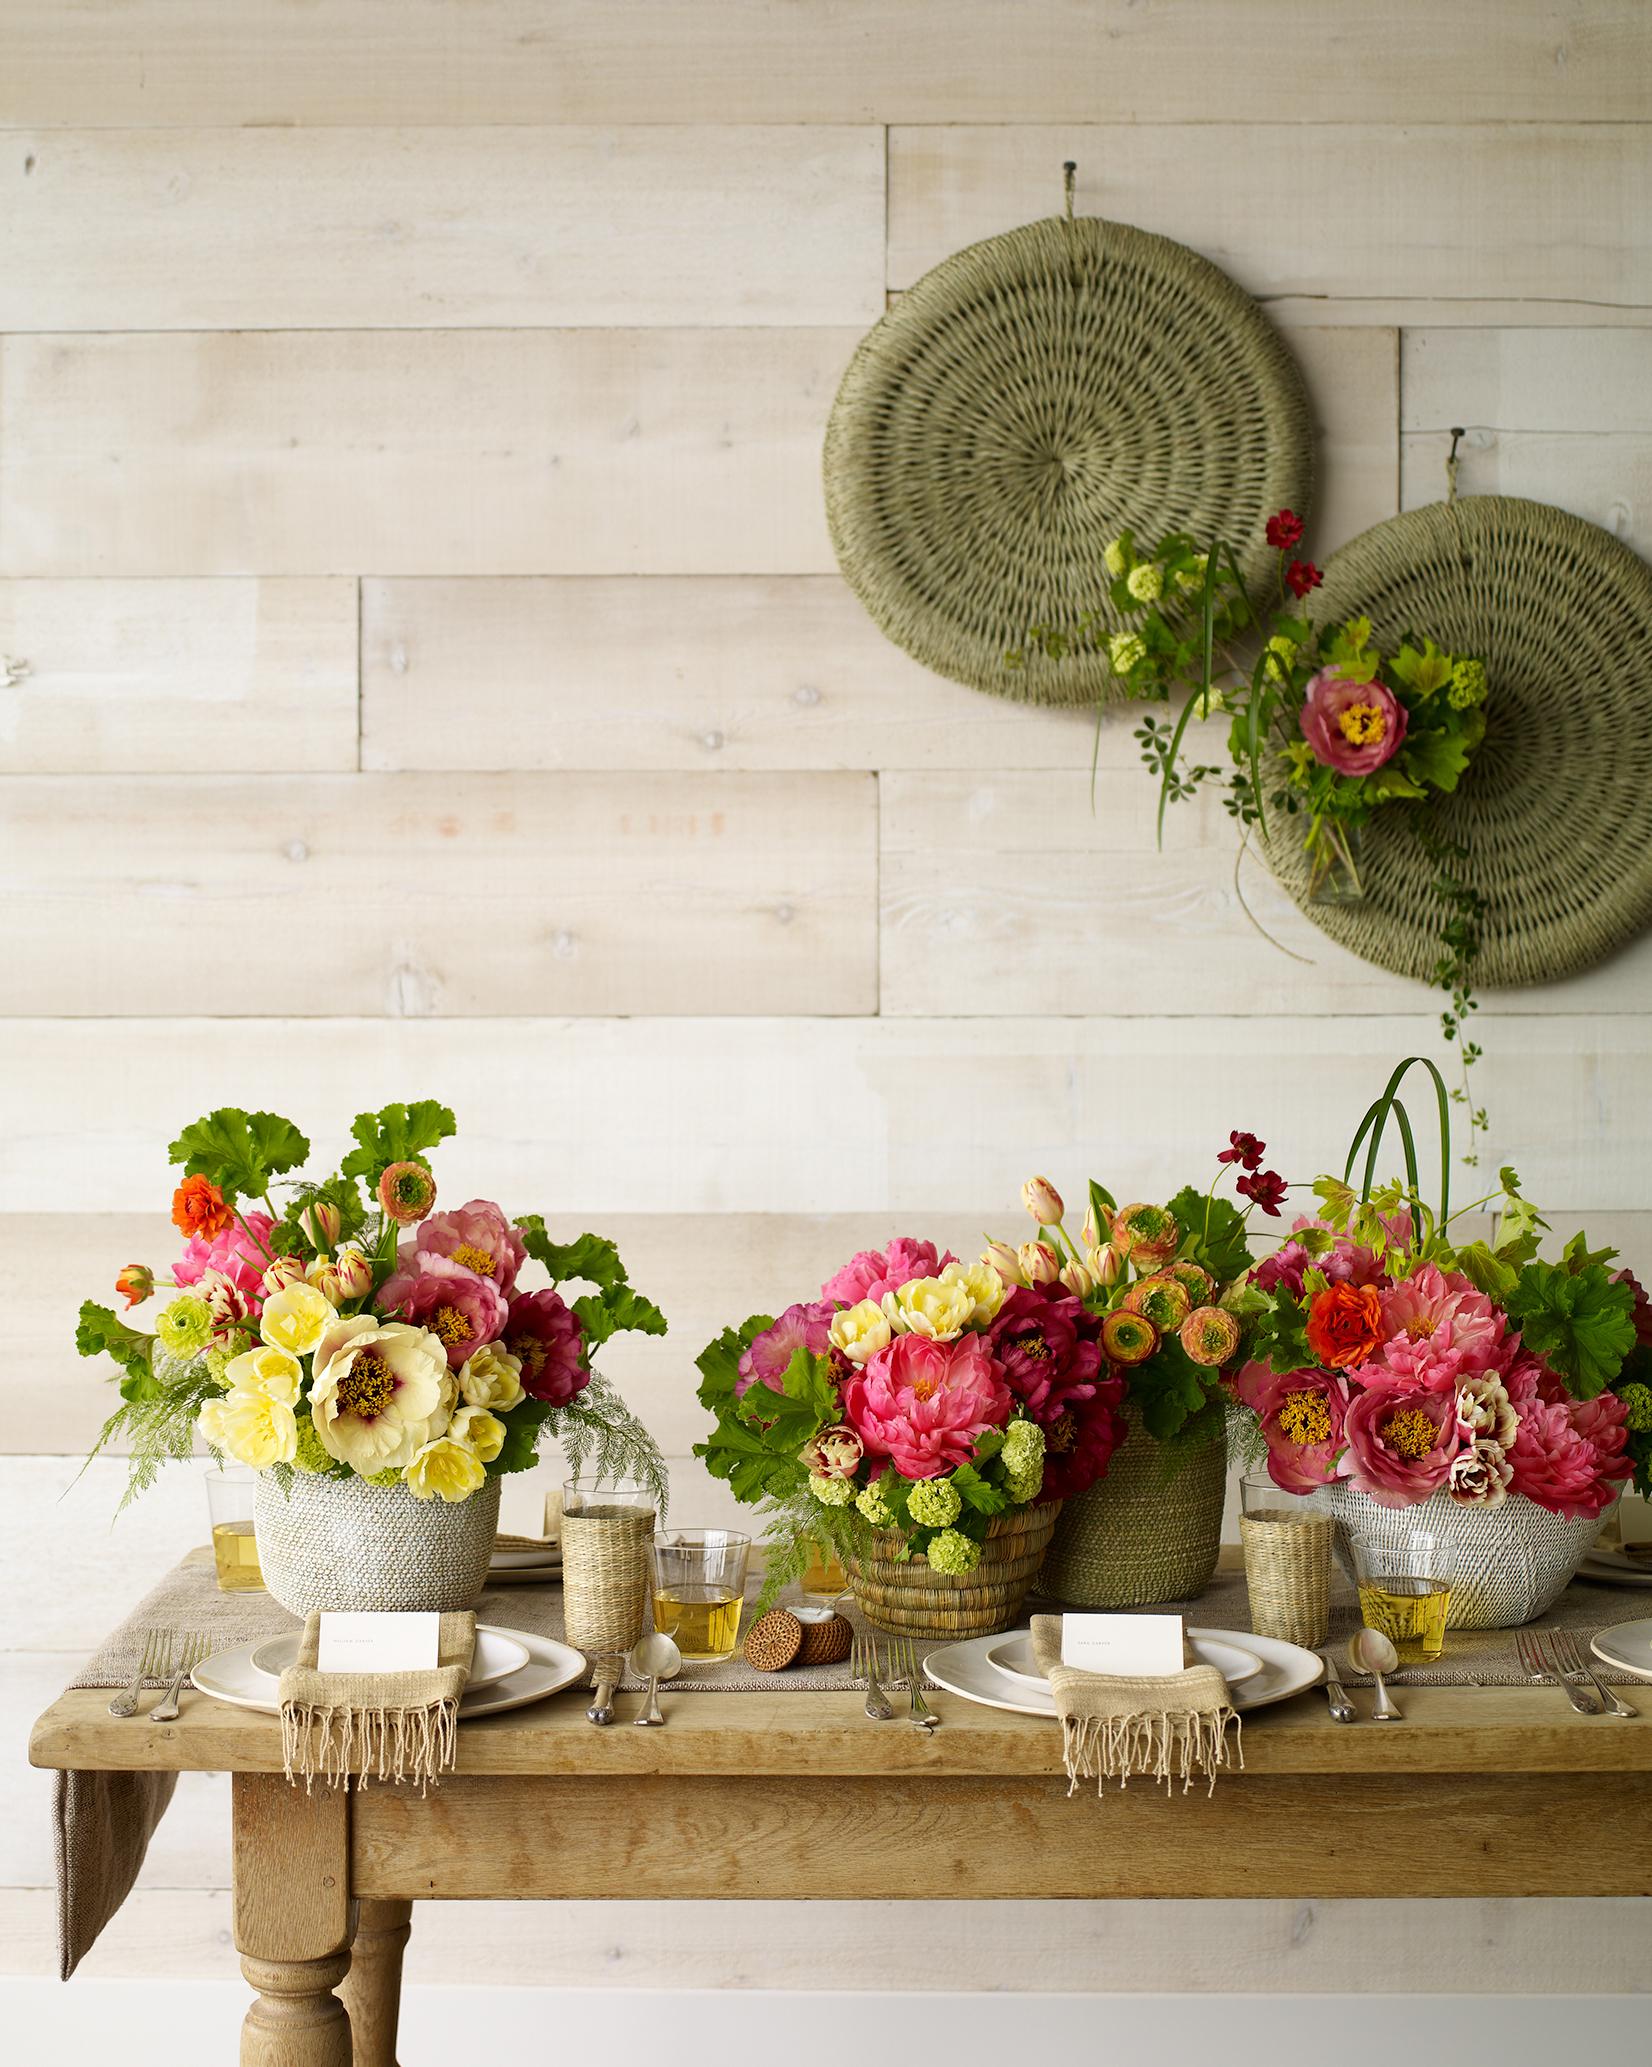 spring-flower-expert-green-vase-centerpiece-sp11-0315.jpg